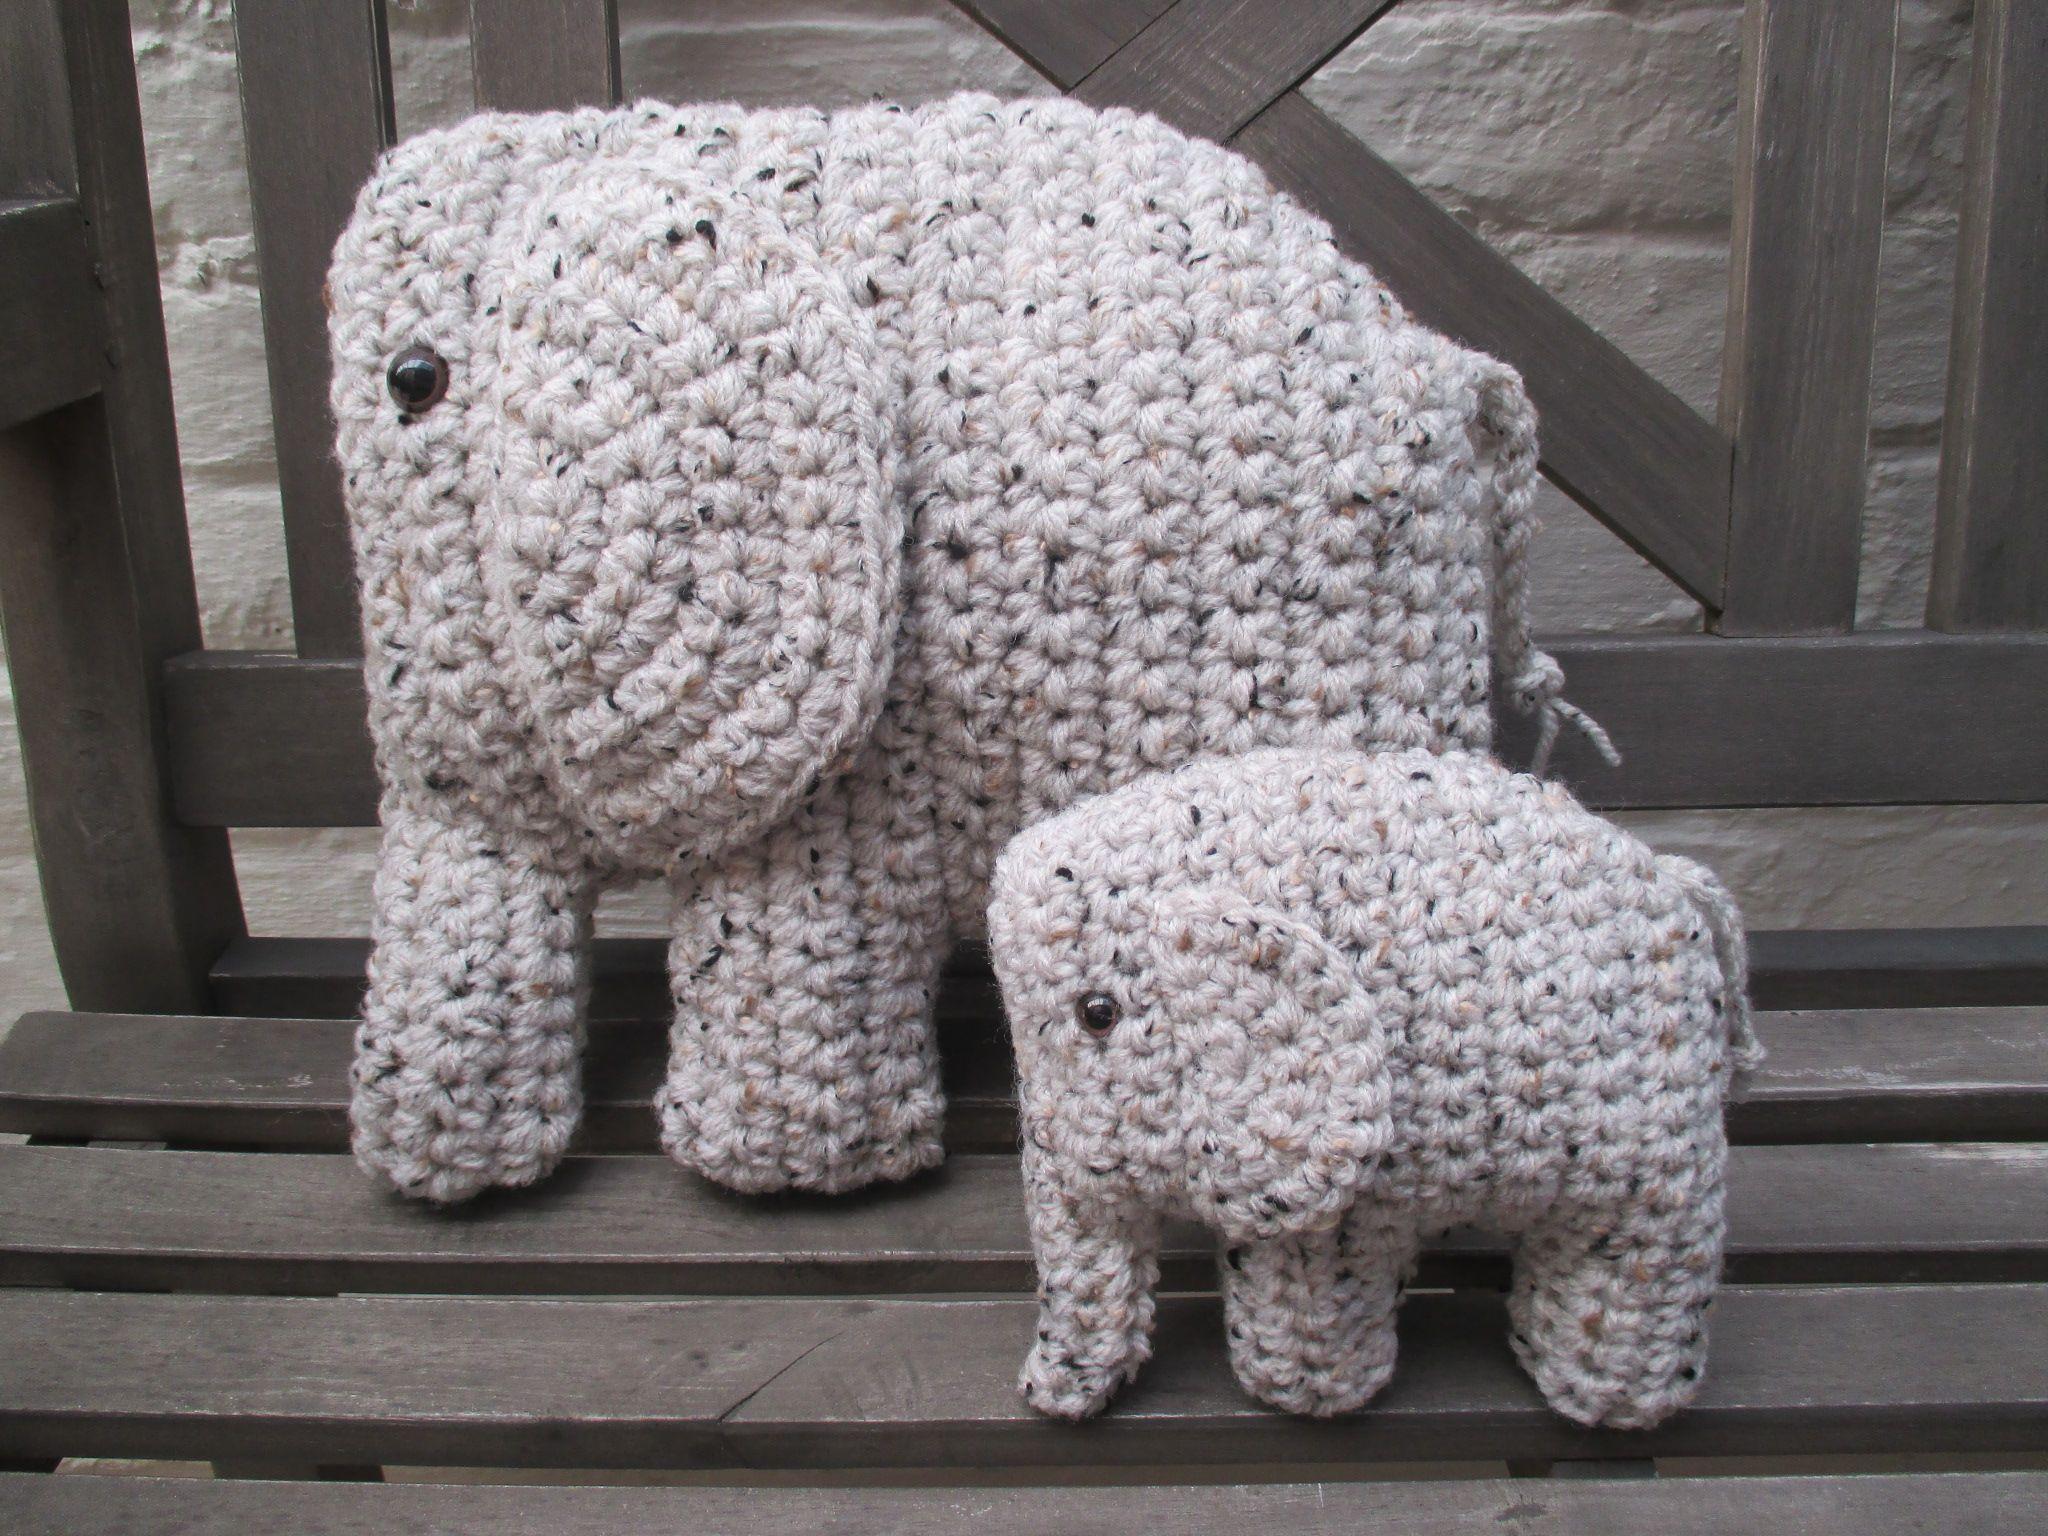 Gehaakte olifant als kinderkamer versiering knuffel crea for Kinderkamer versiering